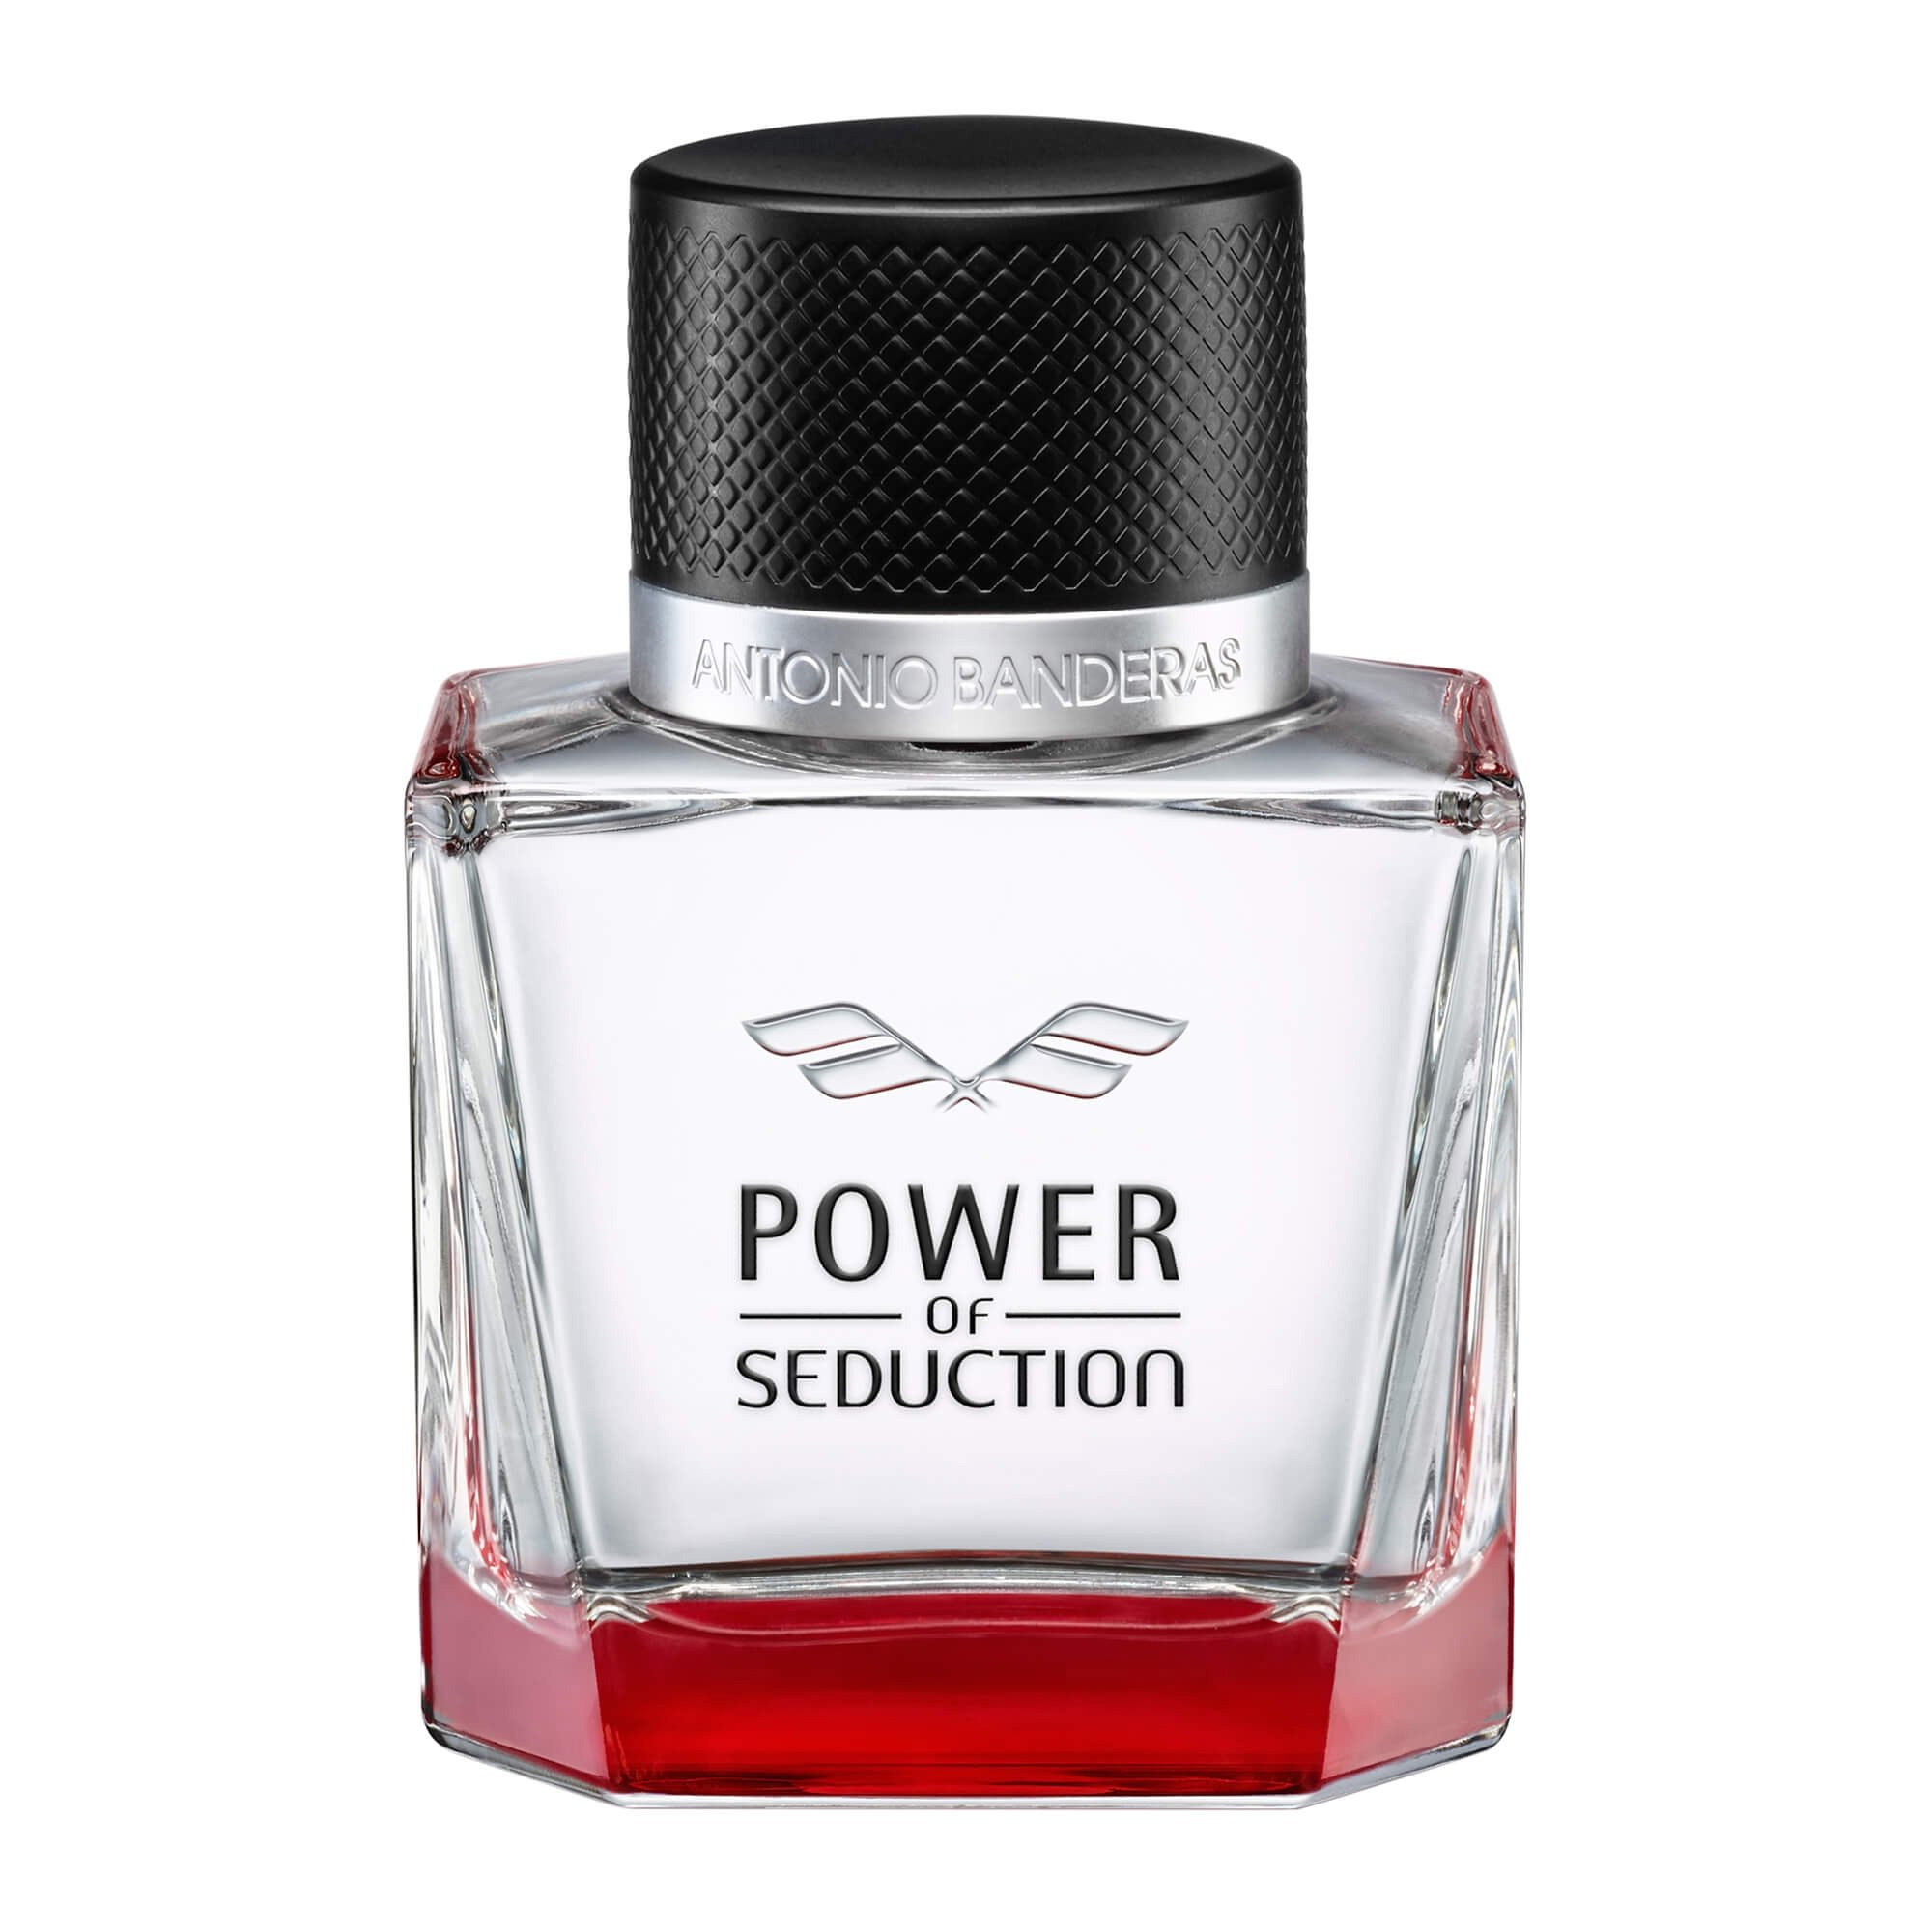 Power Of Seduction Antonio Banderas - Perfume Masculino Eau de Toilette - 200ml